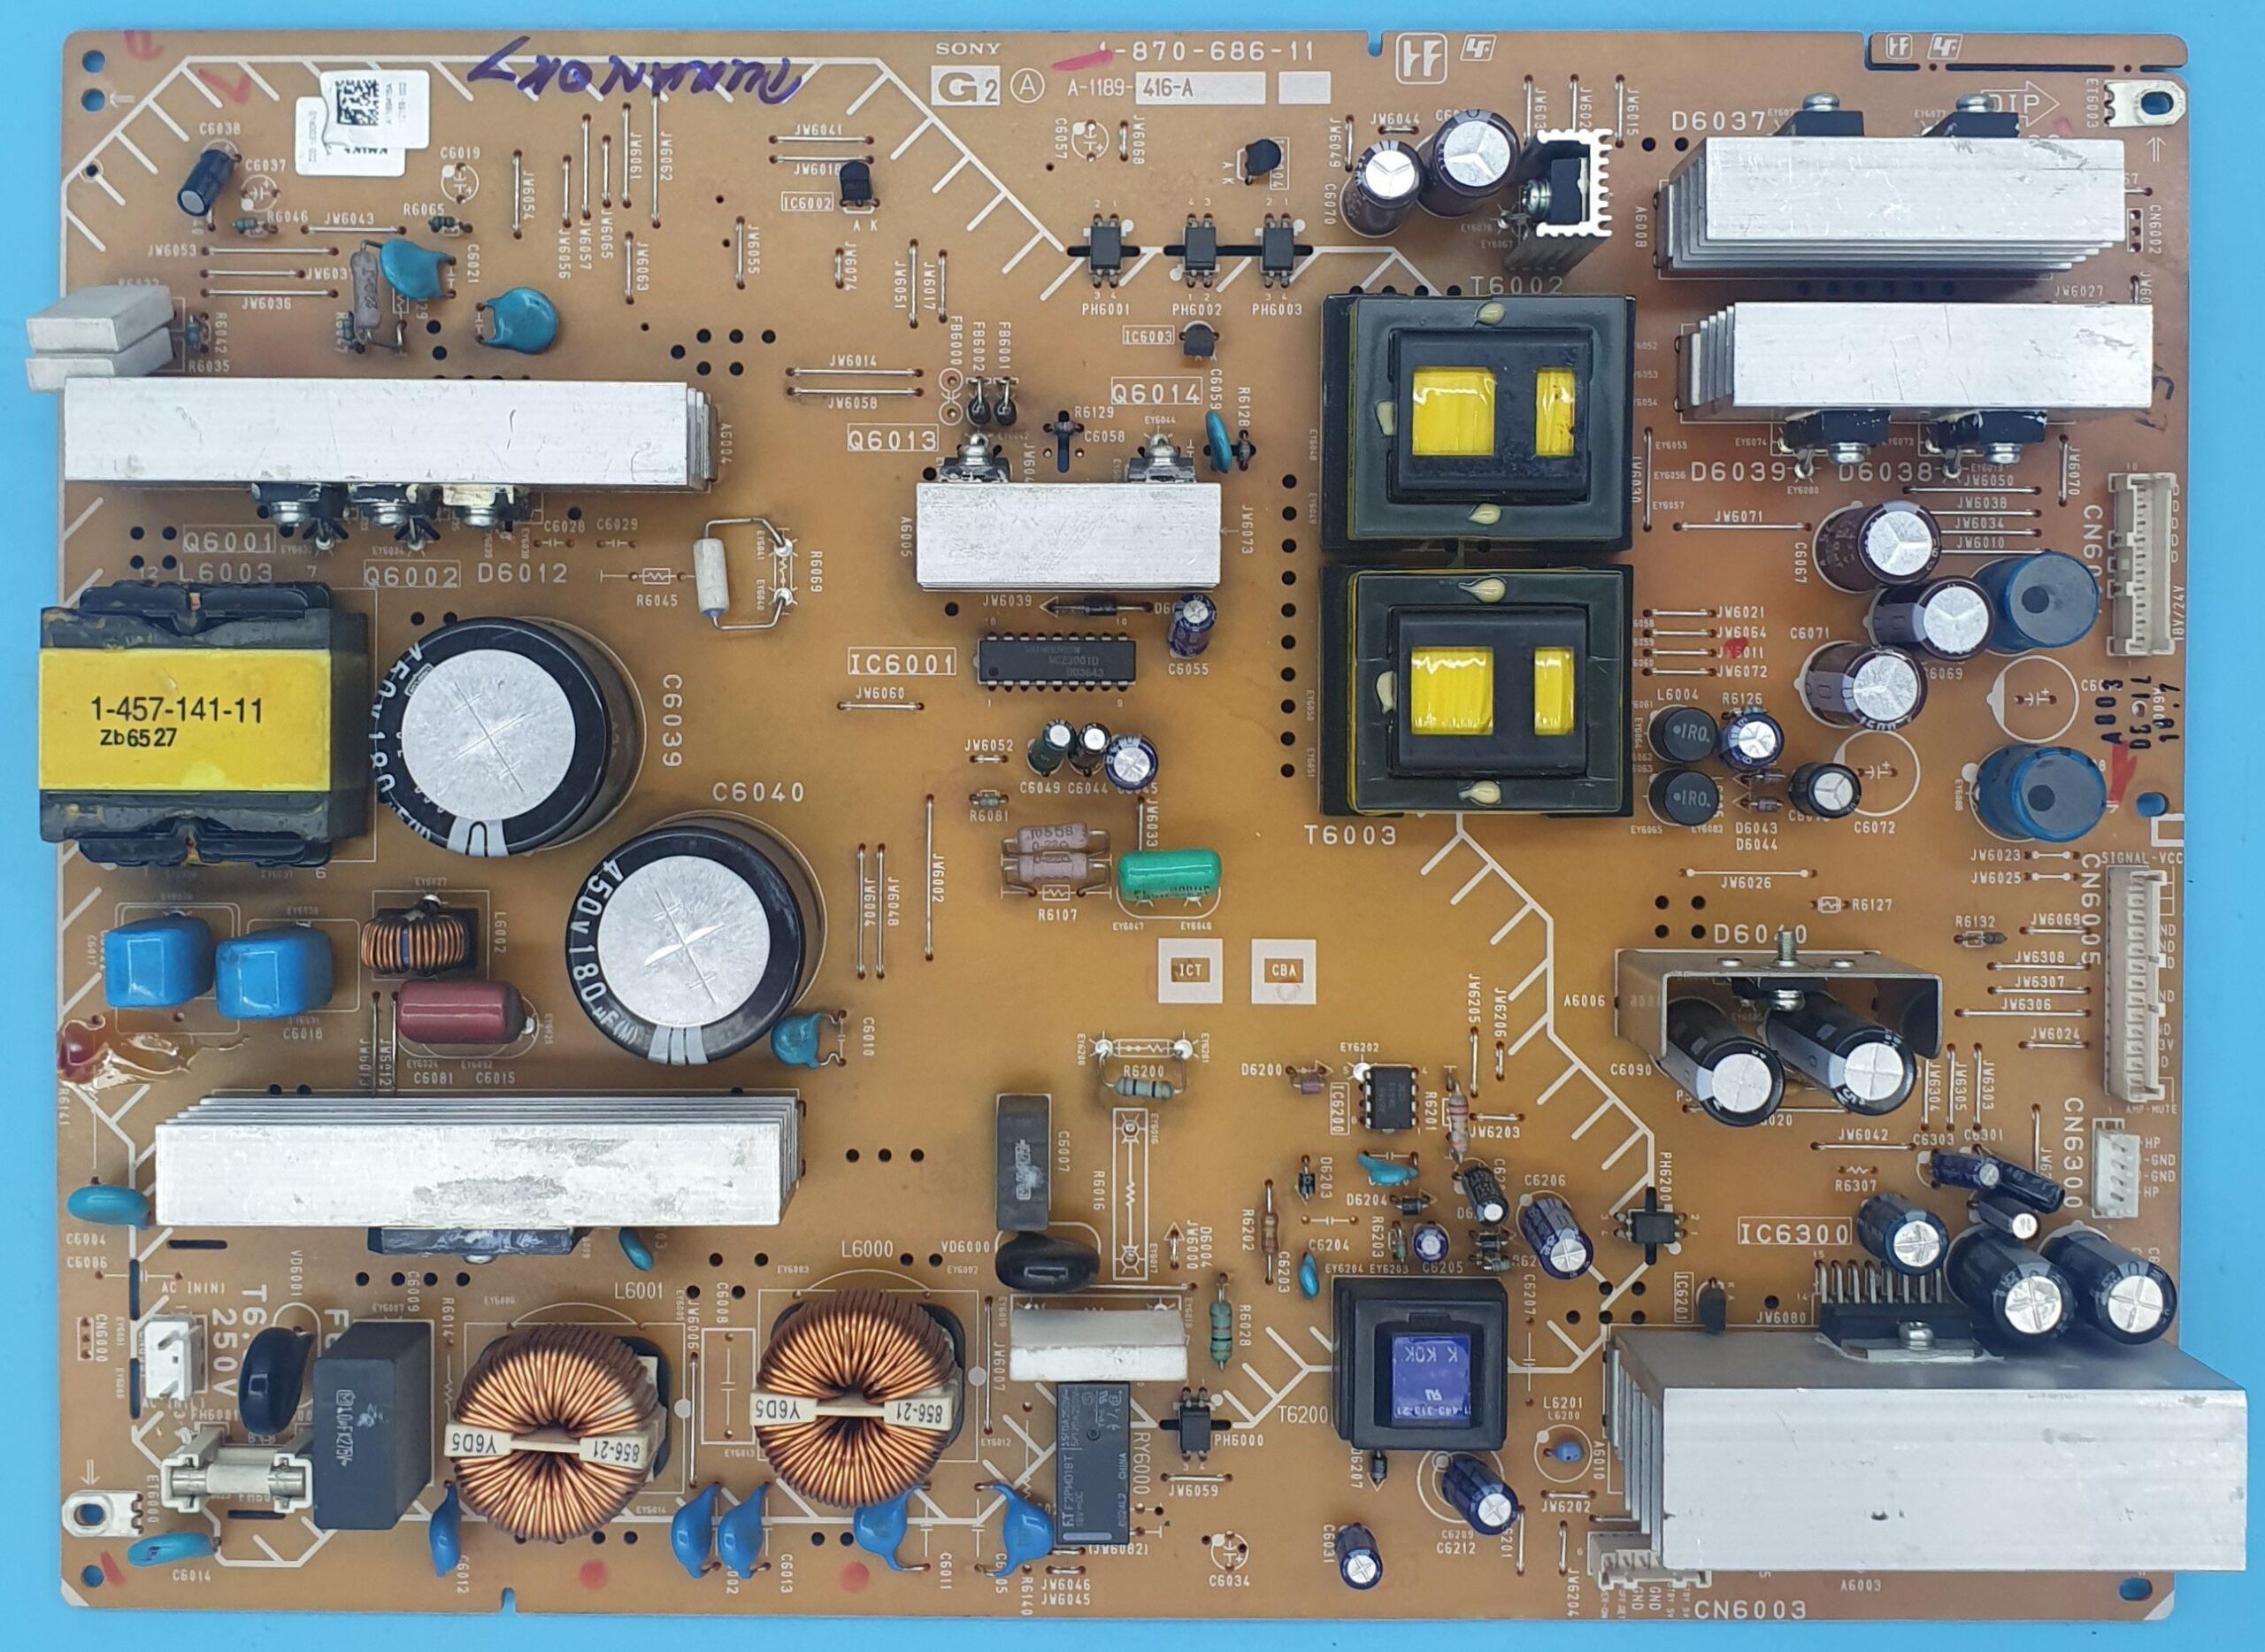 1-870-686-11 Sony Power (KDV DAHİL = 150 TL)